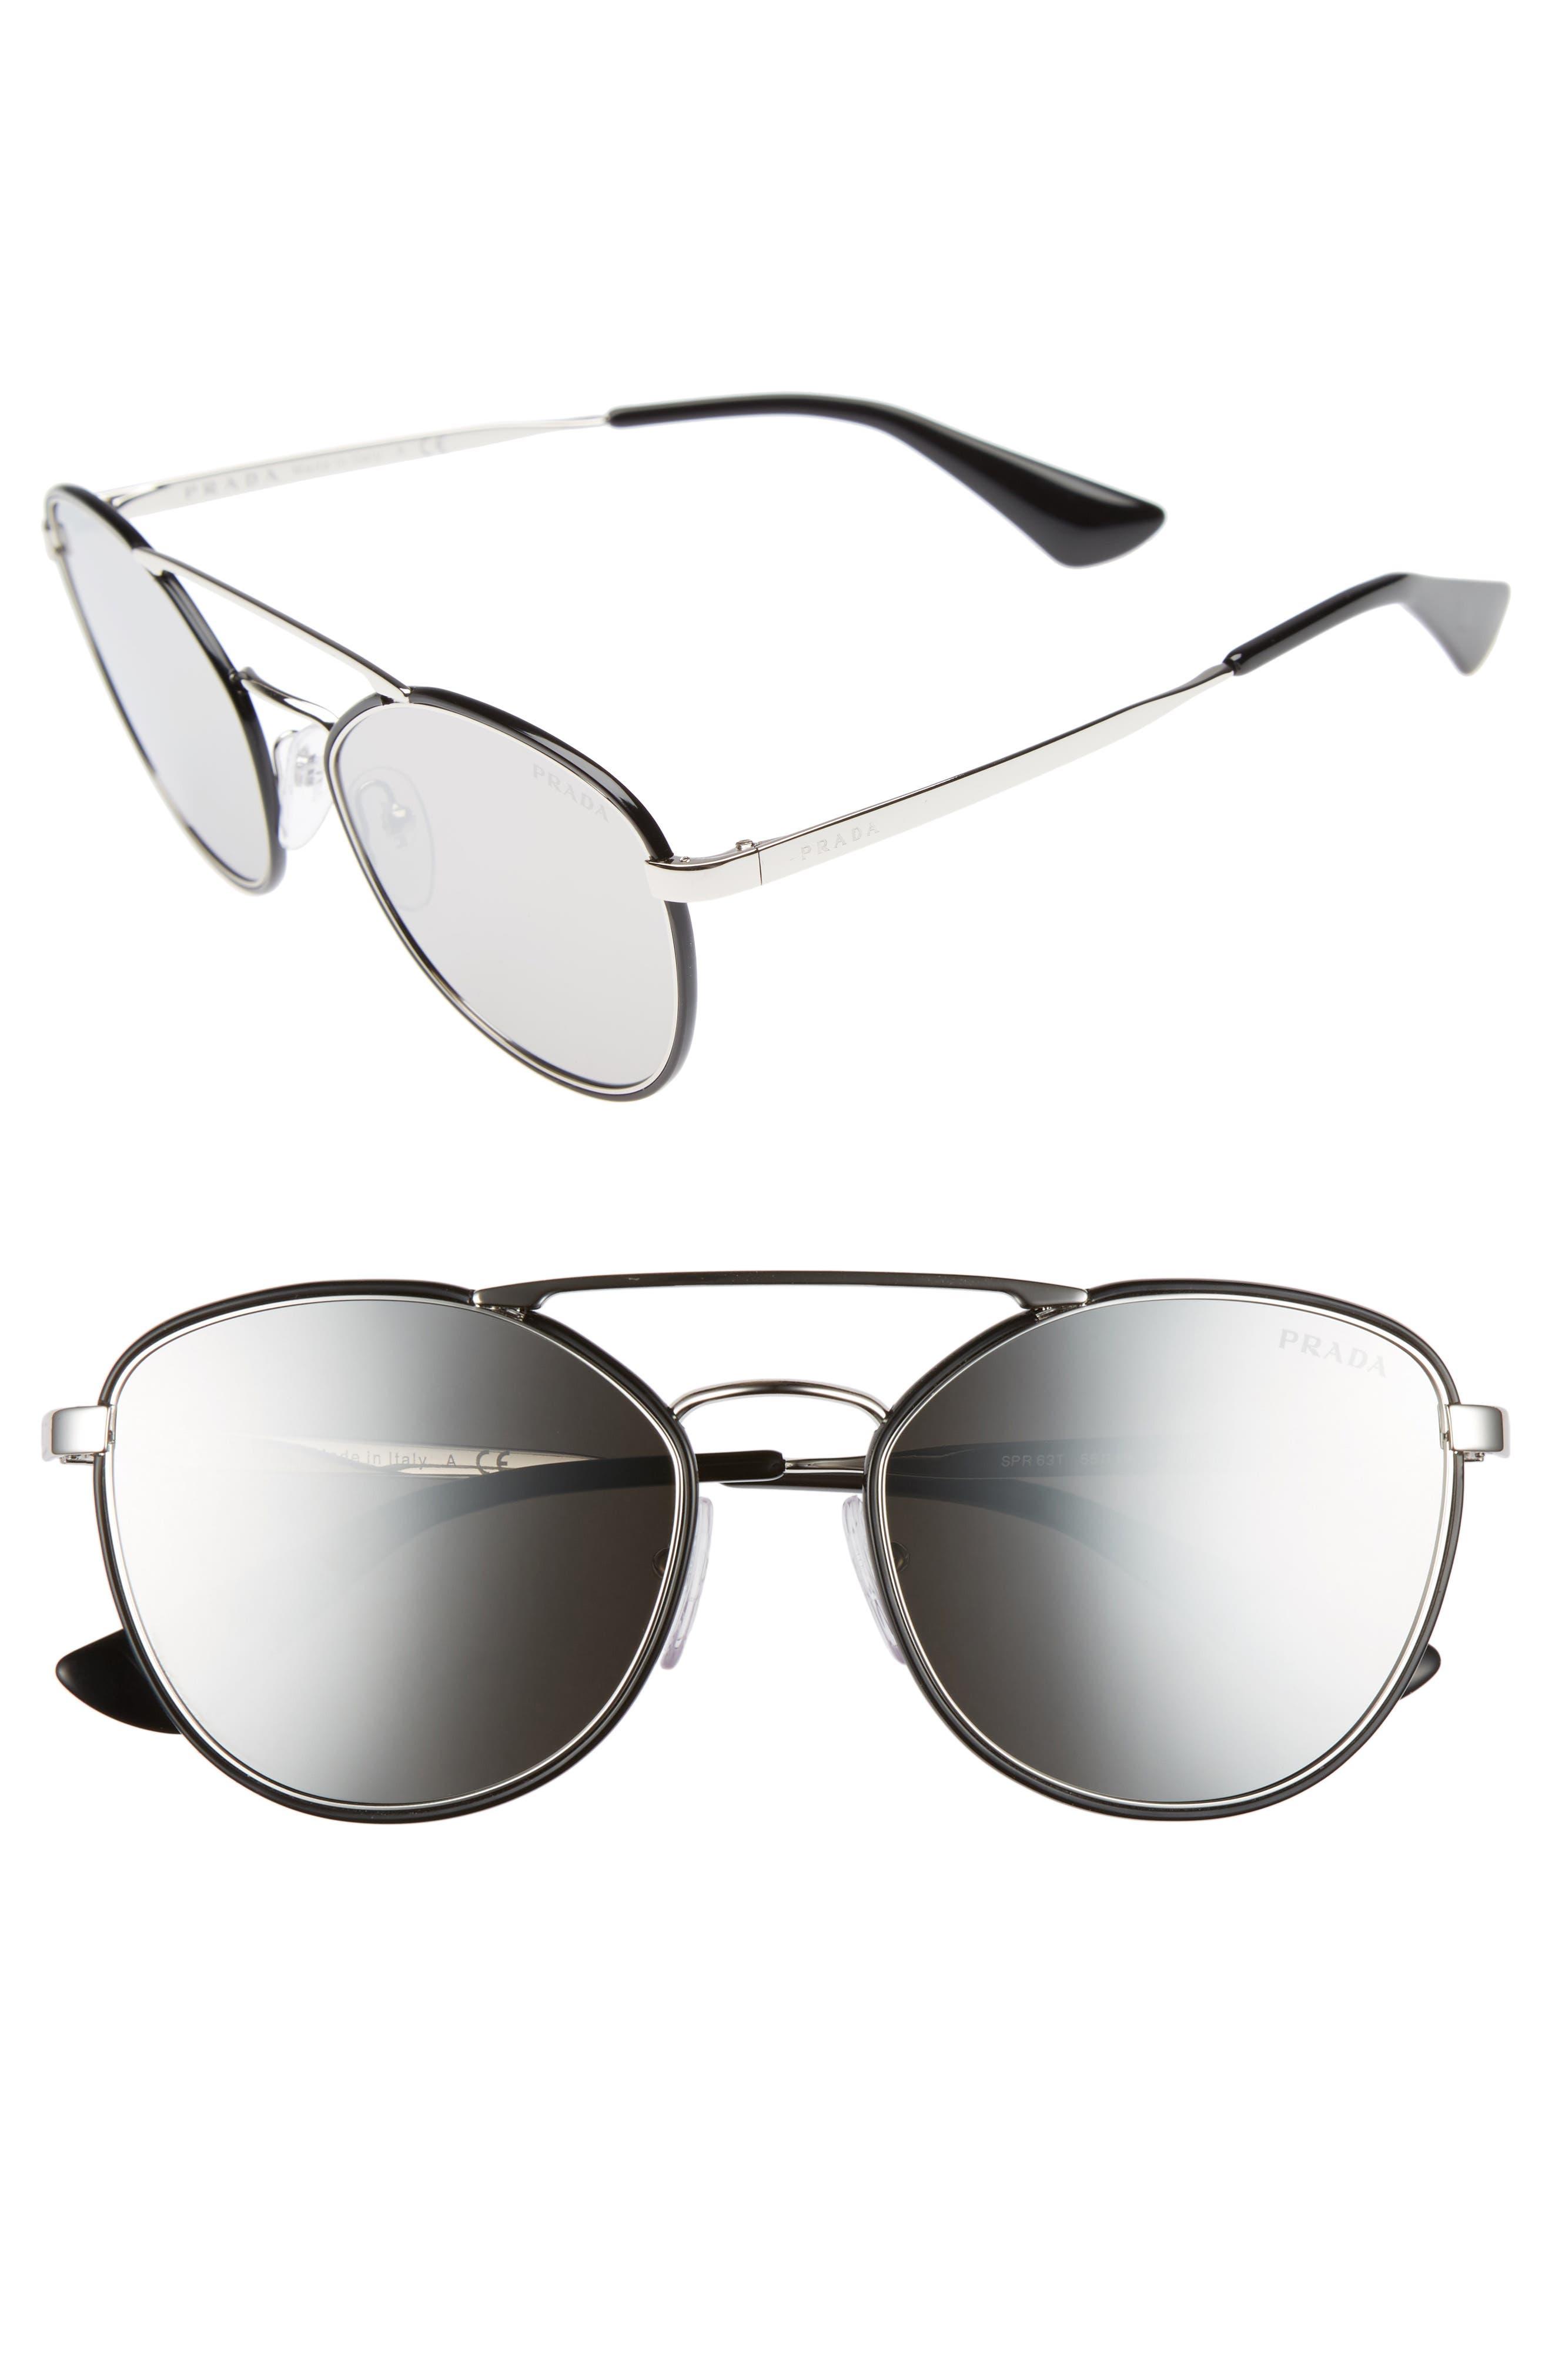 55mm Mirrored Aviator Sunglasses,                         Main,                         color, Black/ Grey Mirror